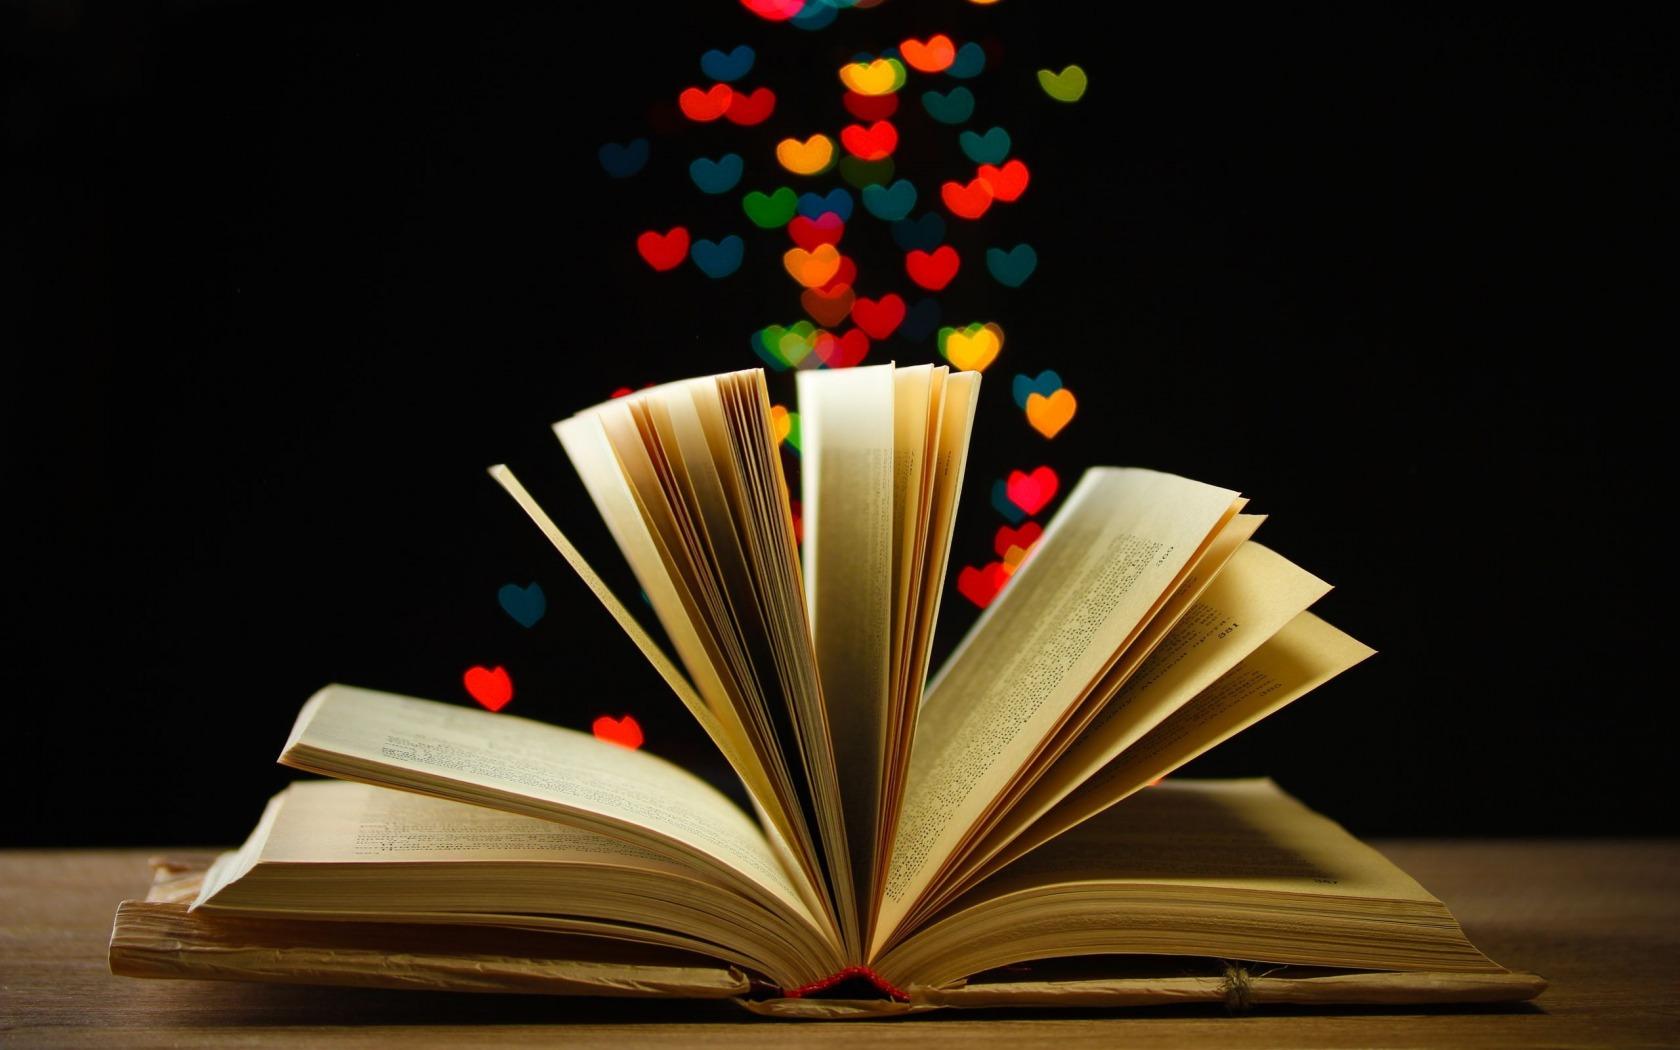 http://www.pausacaffeblog.it/wp/wp-content/uploads/2015/02/libri-san-valentino.jpg